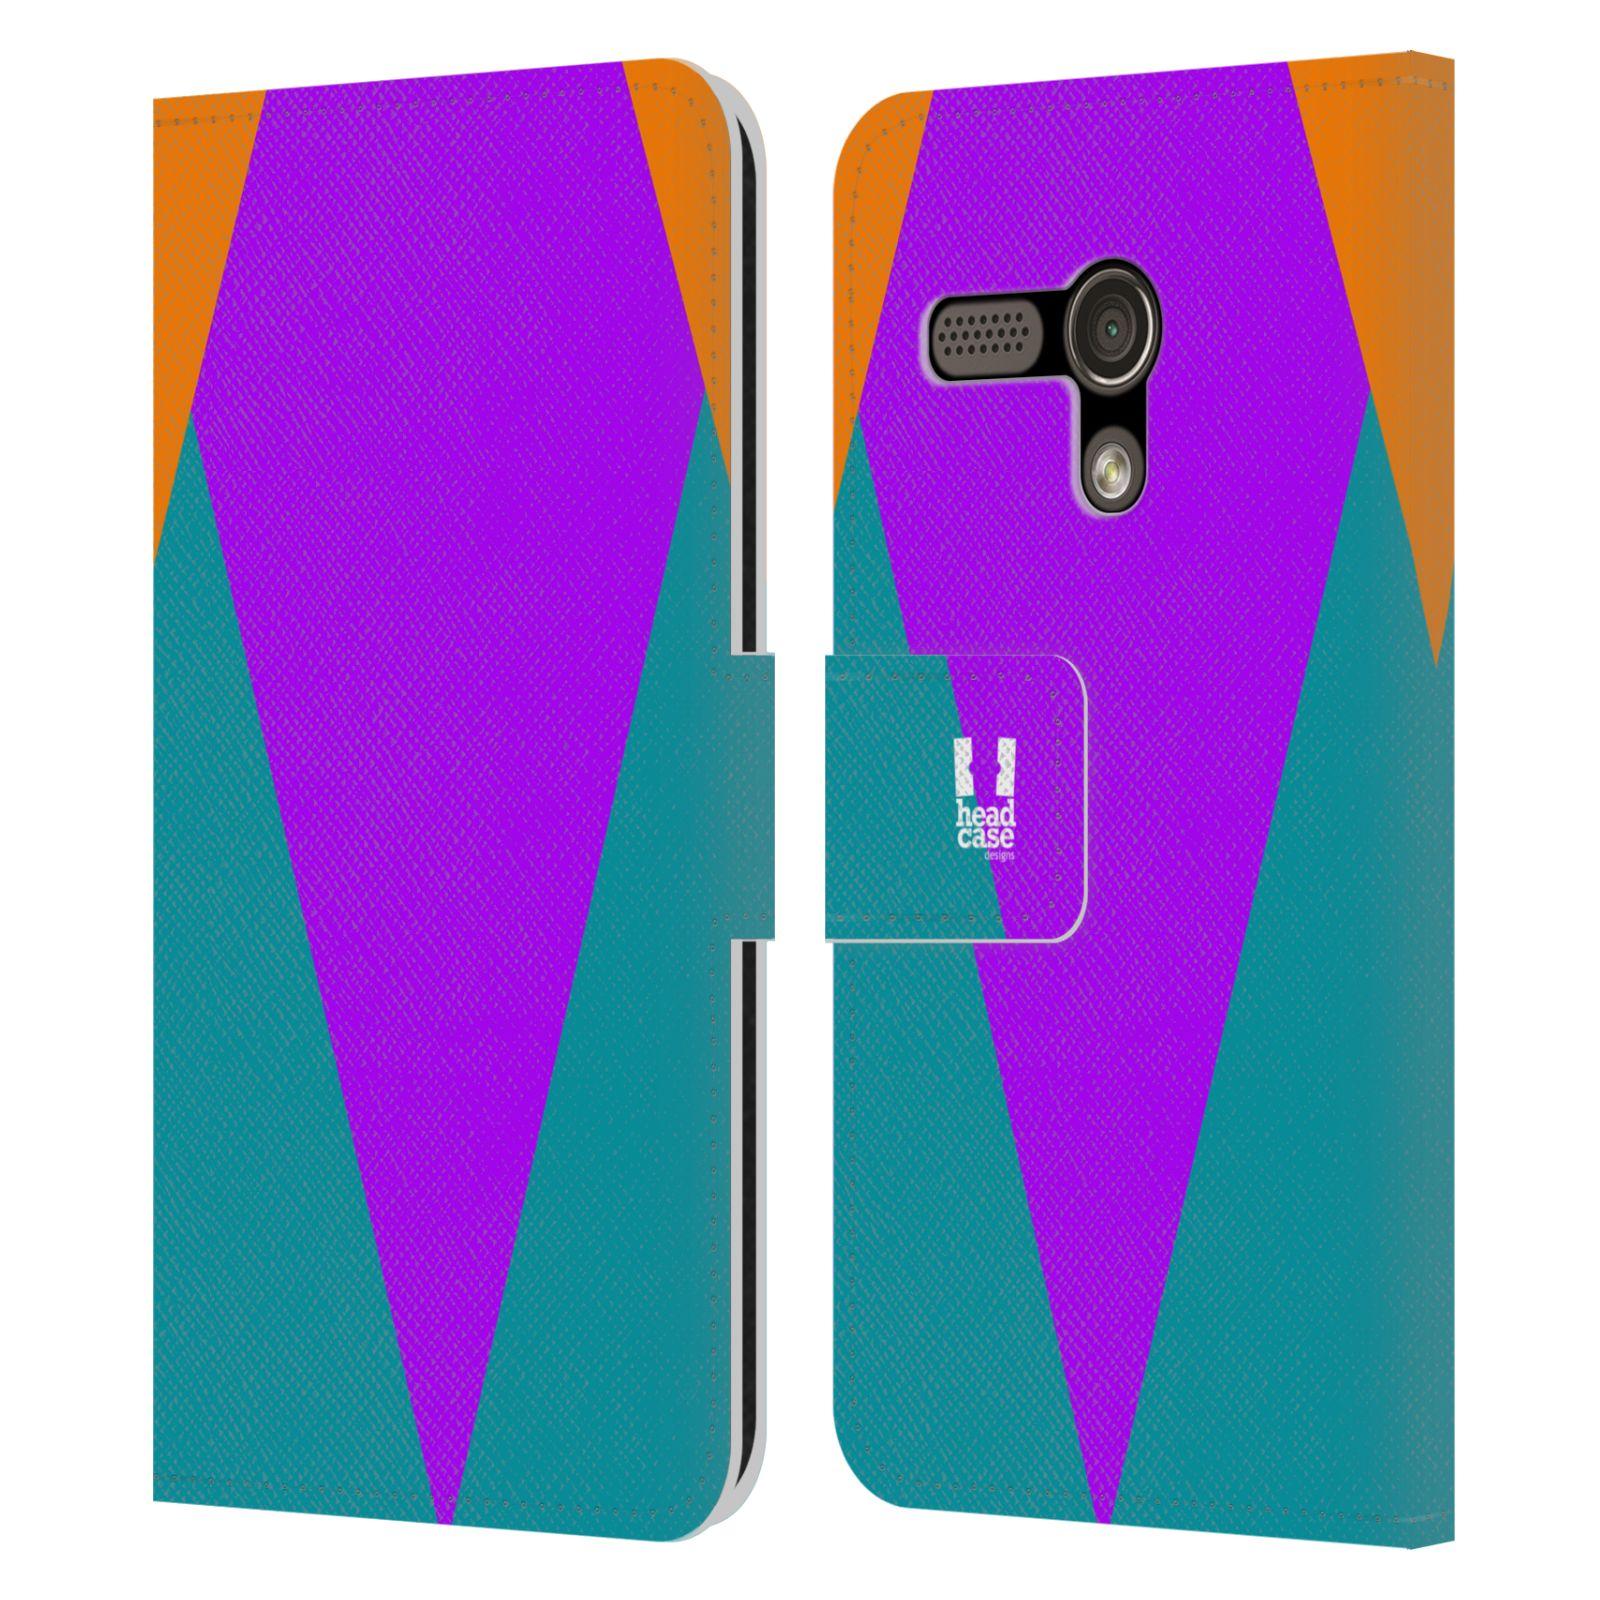 HEAD CASE Flipové pouzdro pro mobil Motorola MOTO G barevné tvary šipka fialová